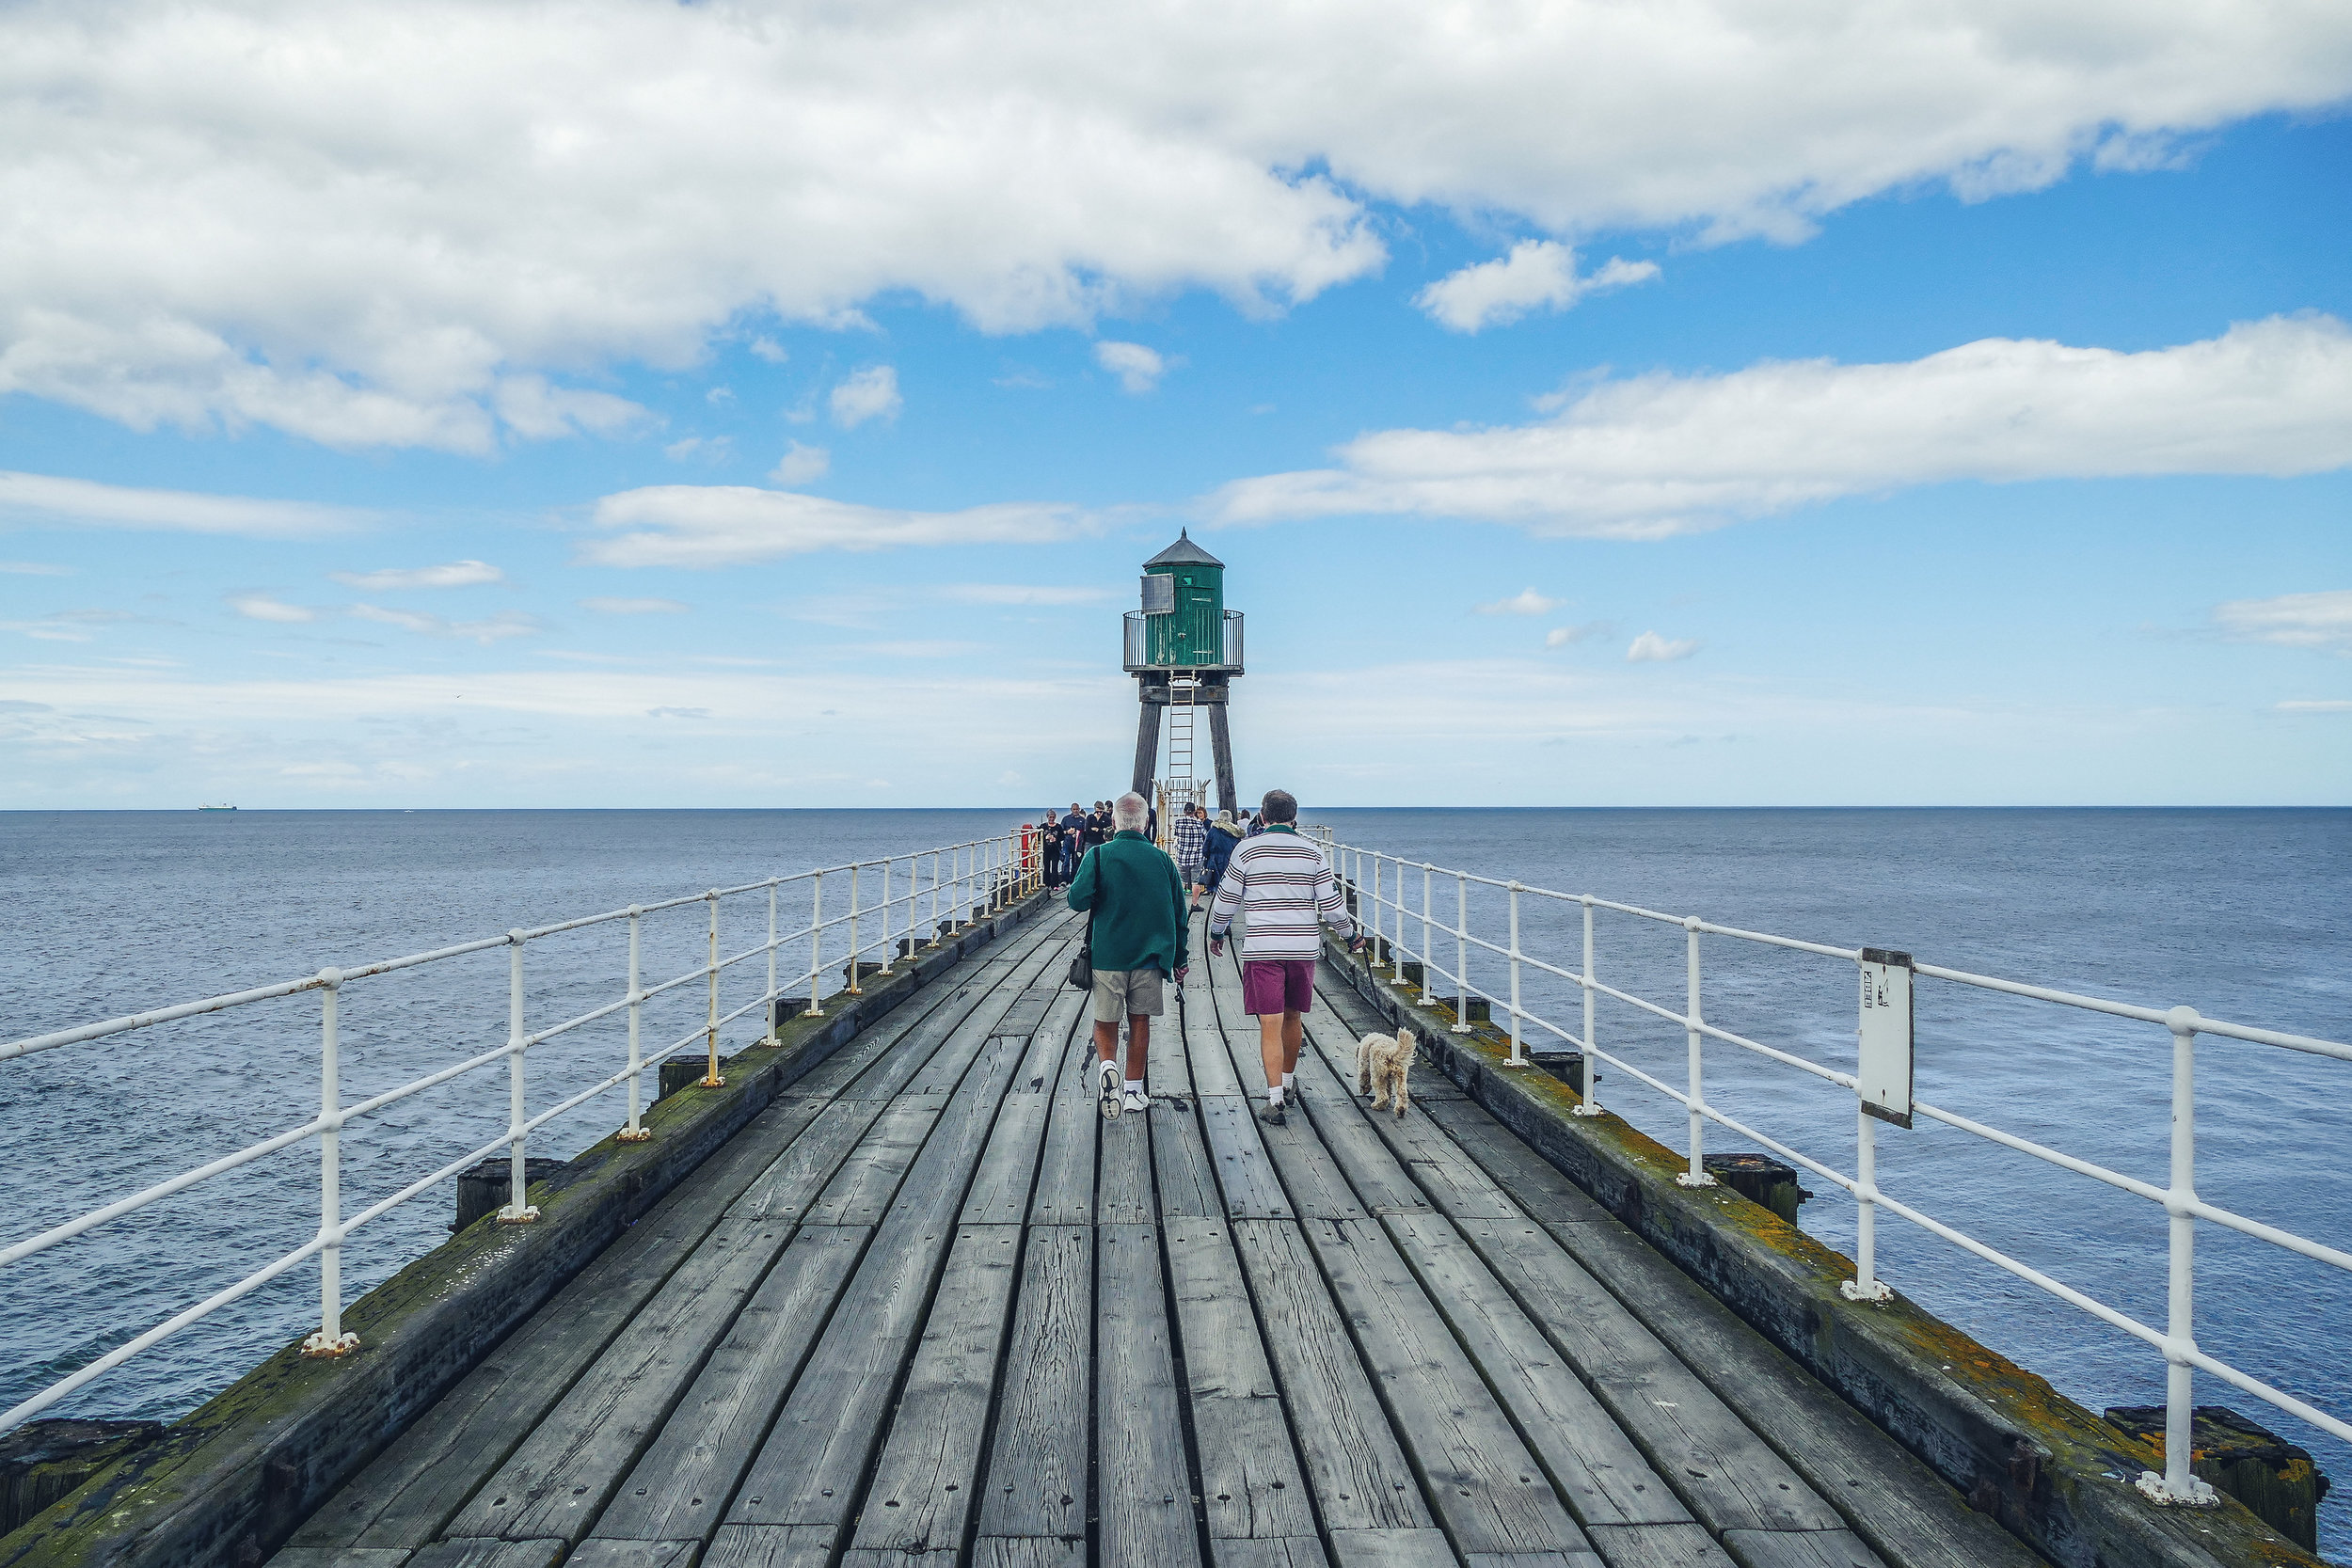 dog walking on pier.jpg